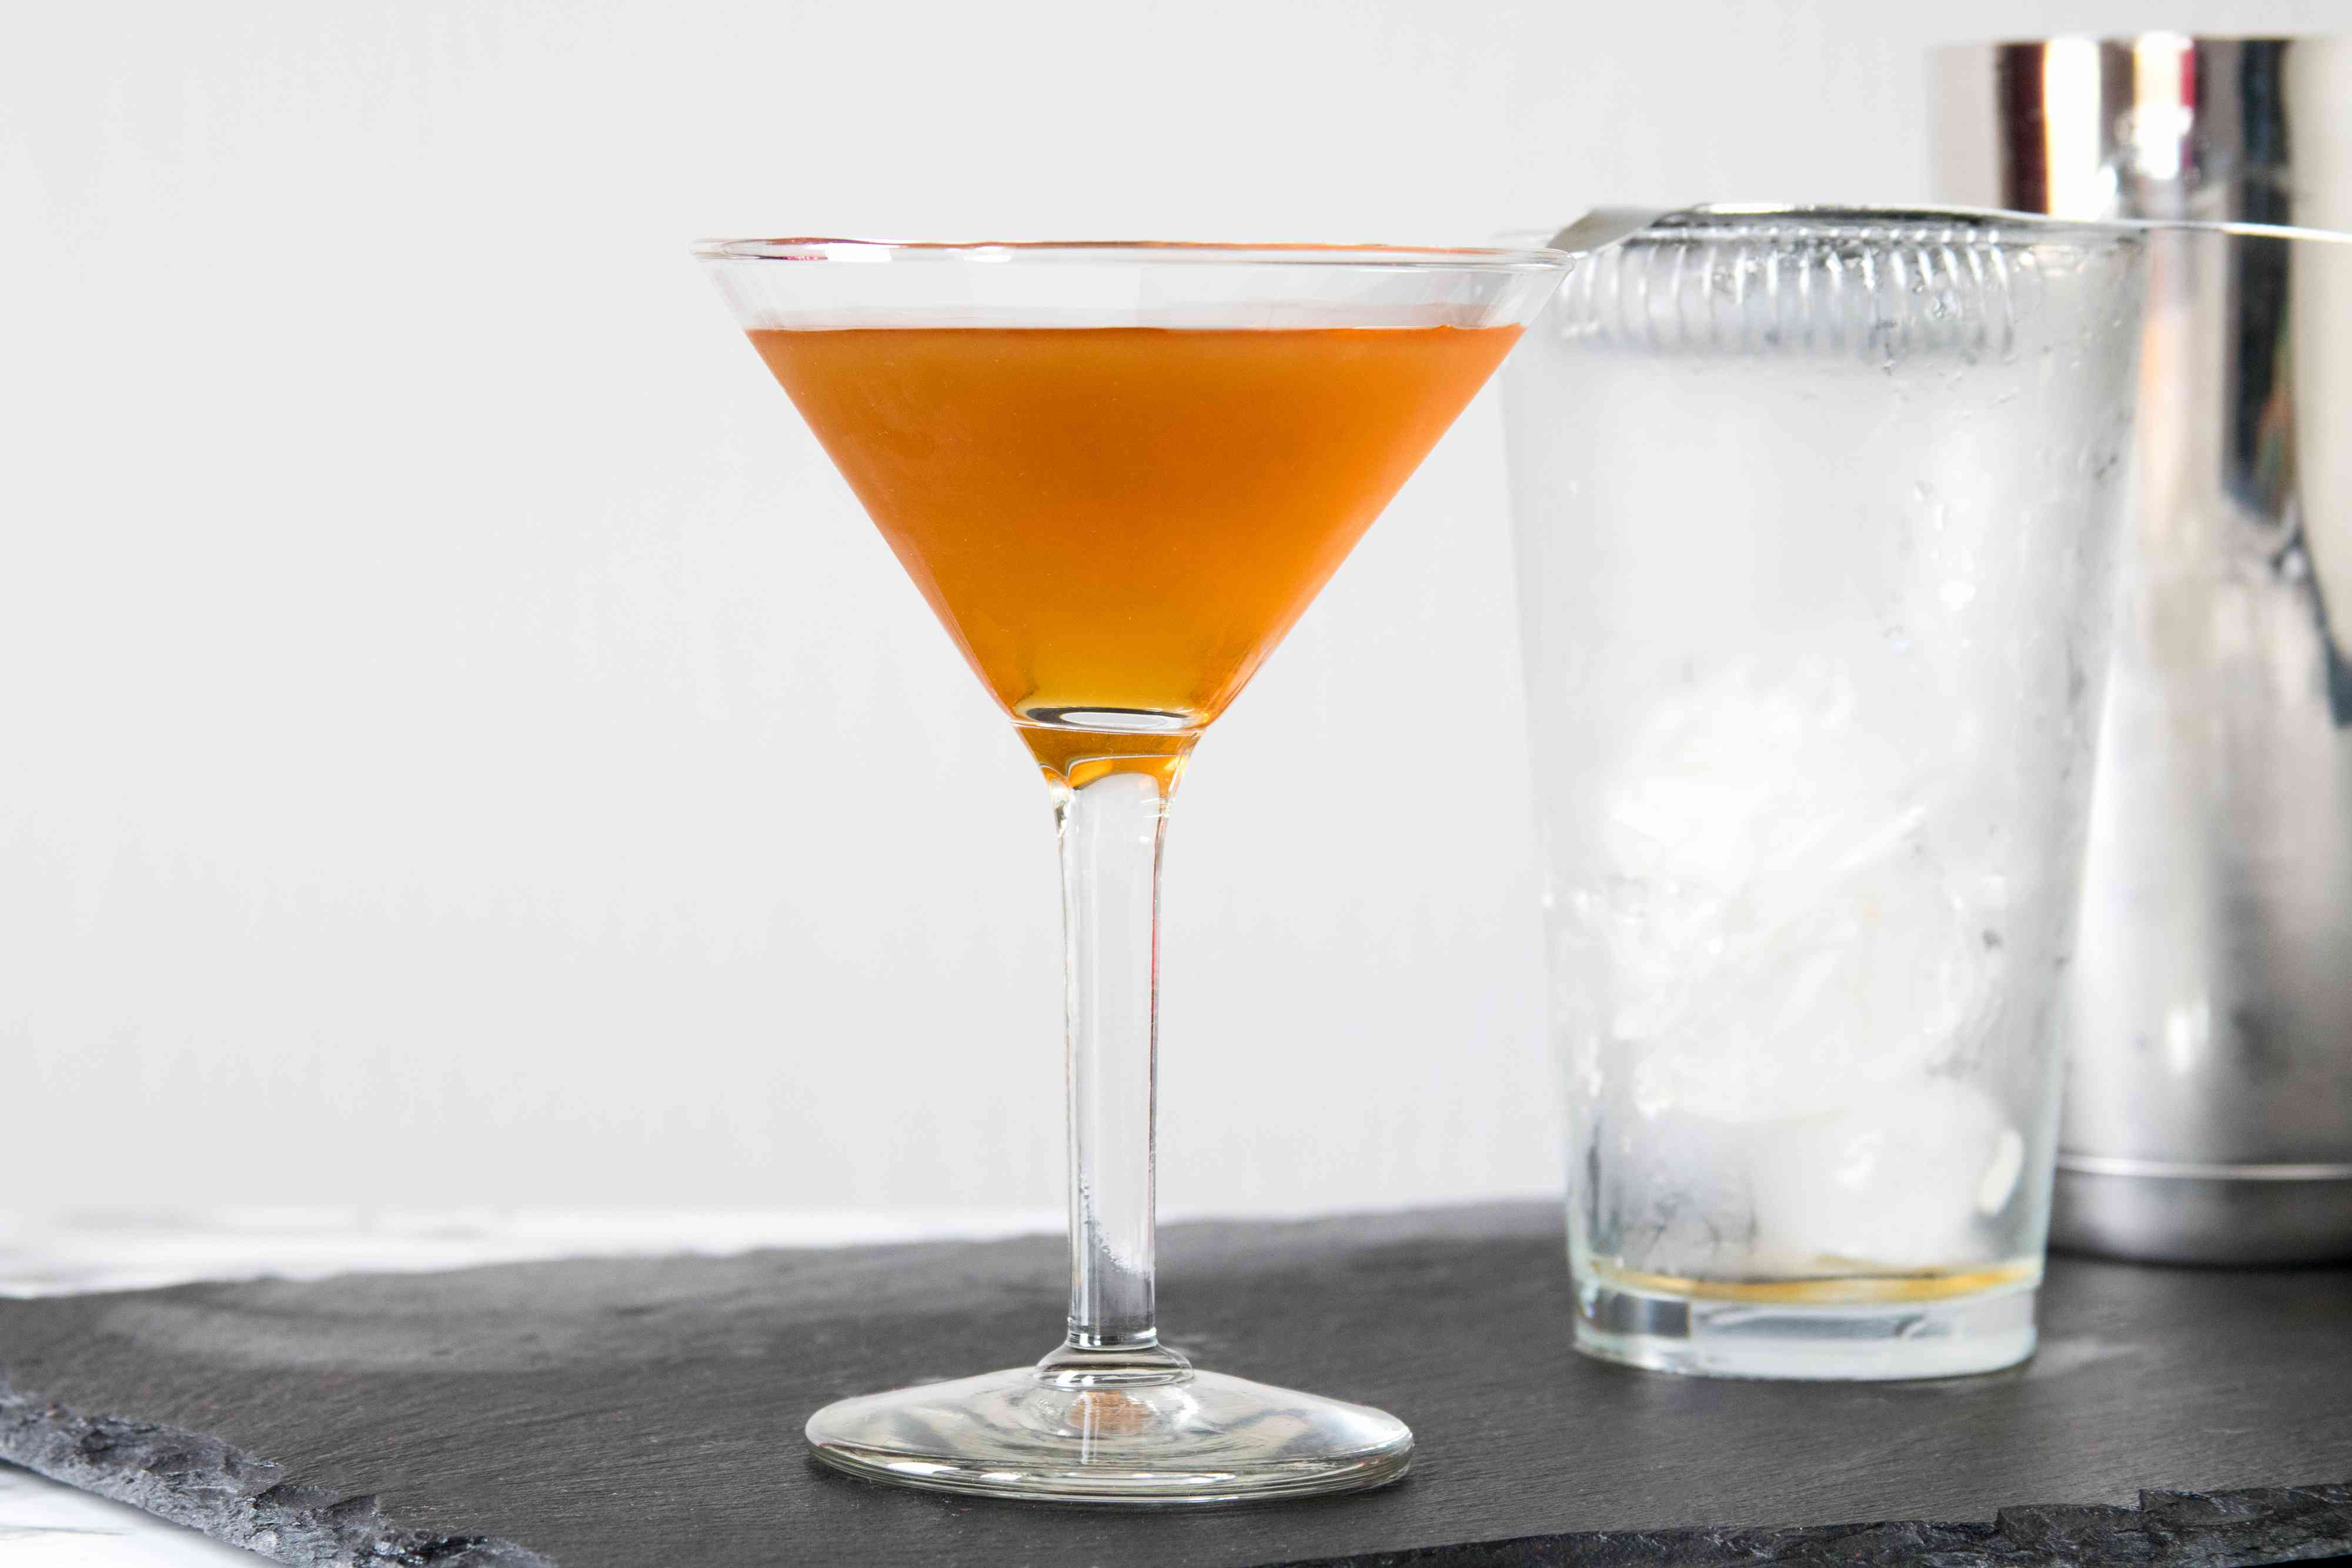 Straining a Classic Brandy Metropolitan Cocktail